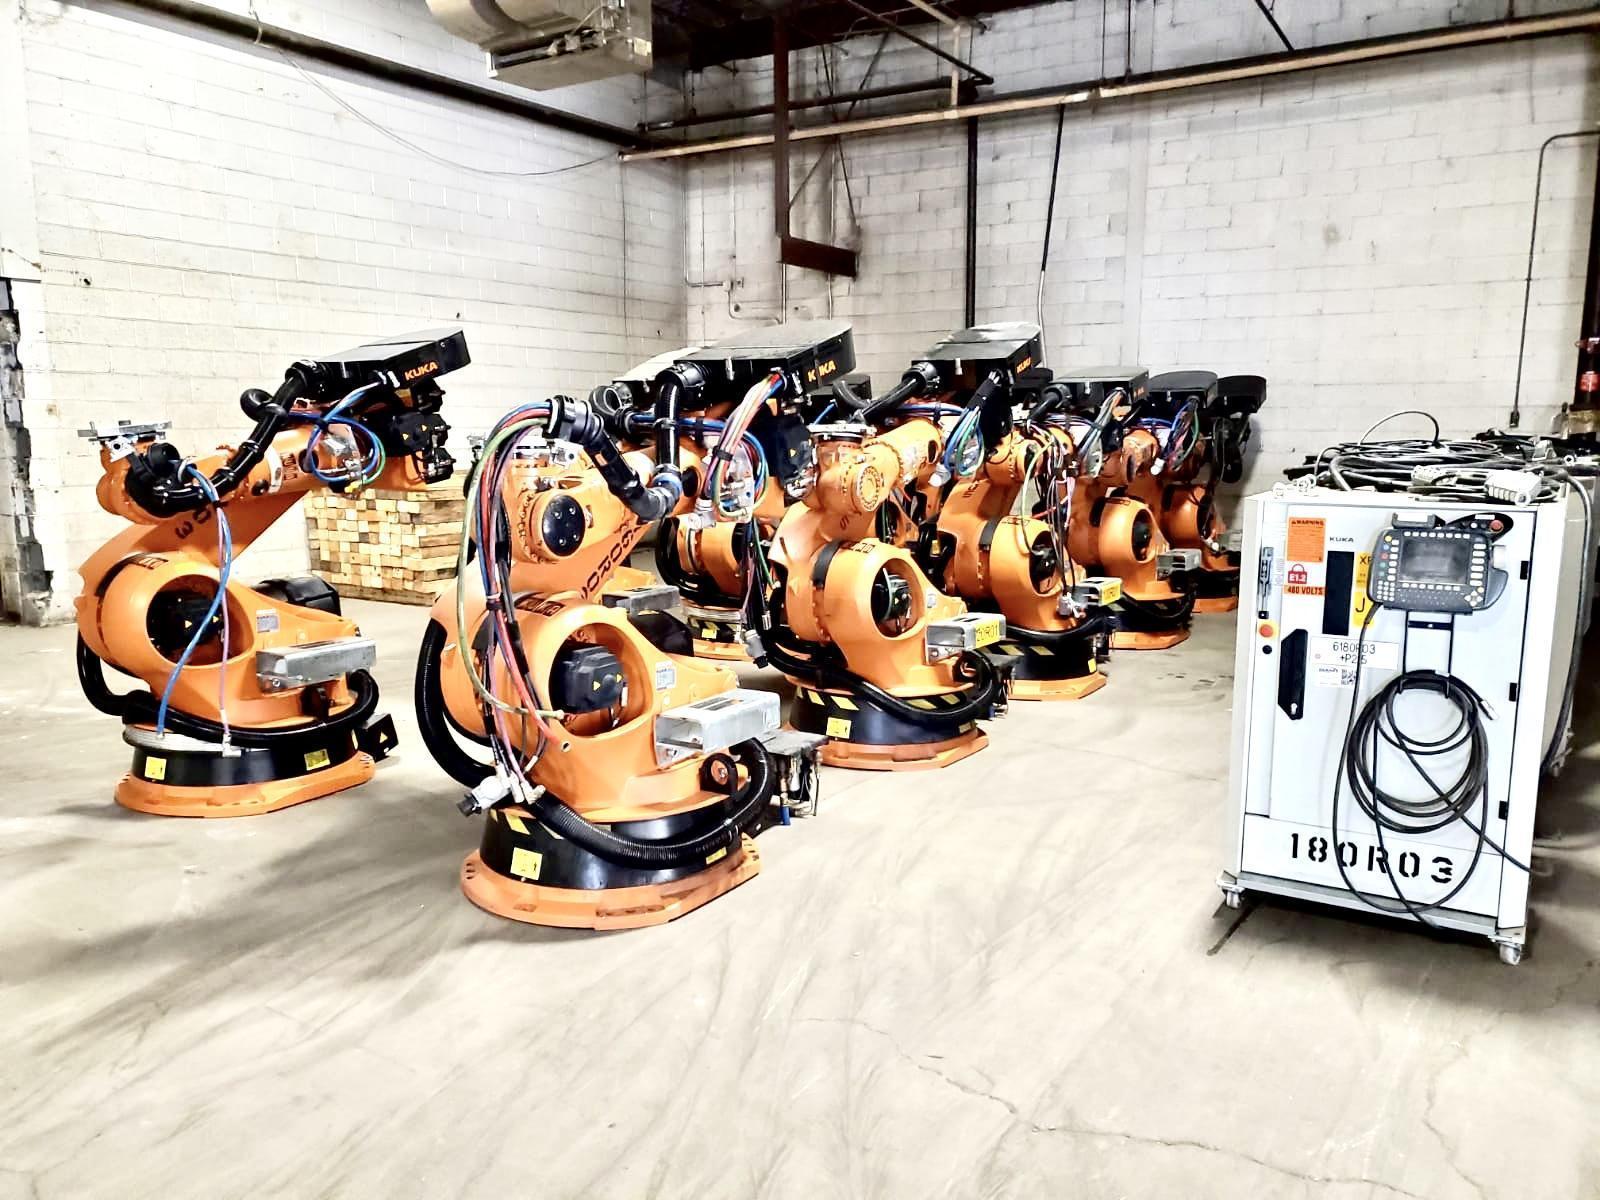 Kuka Robots bulk, wholesale